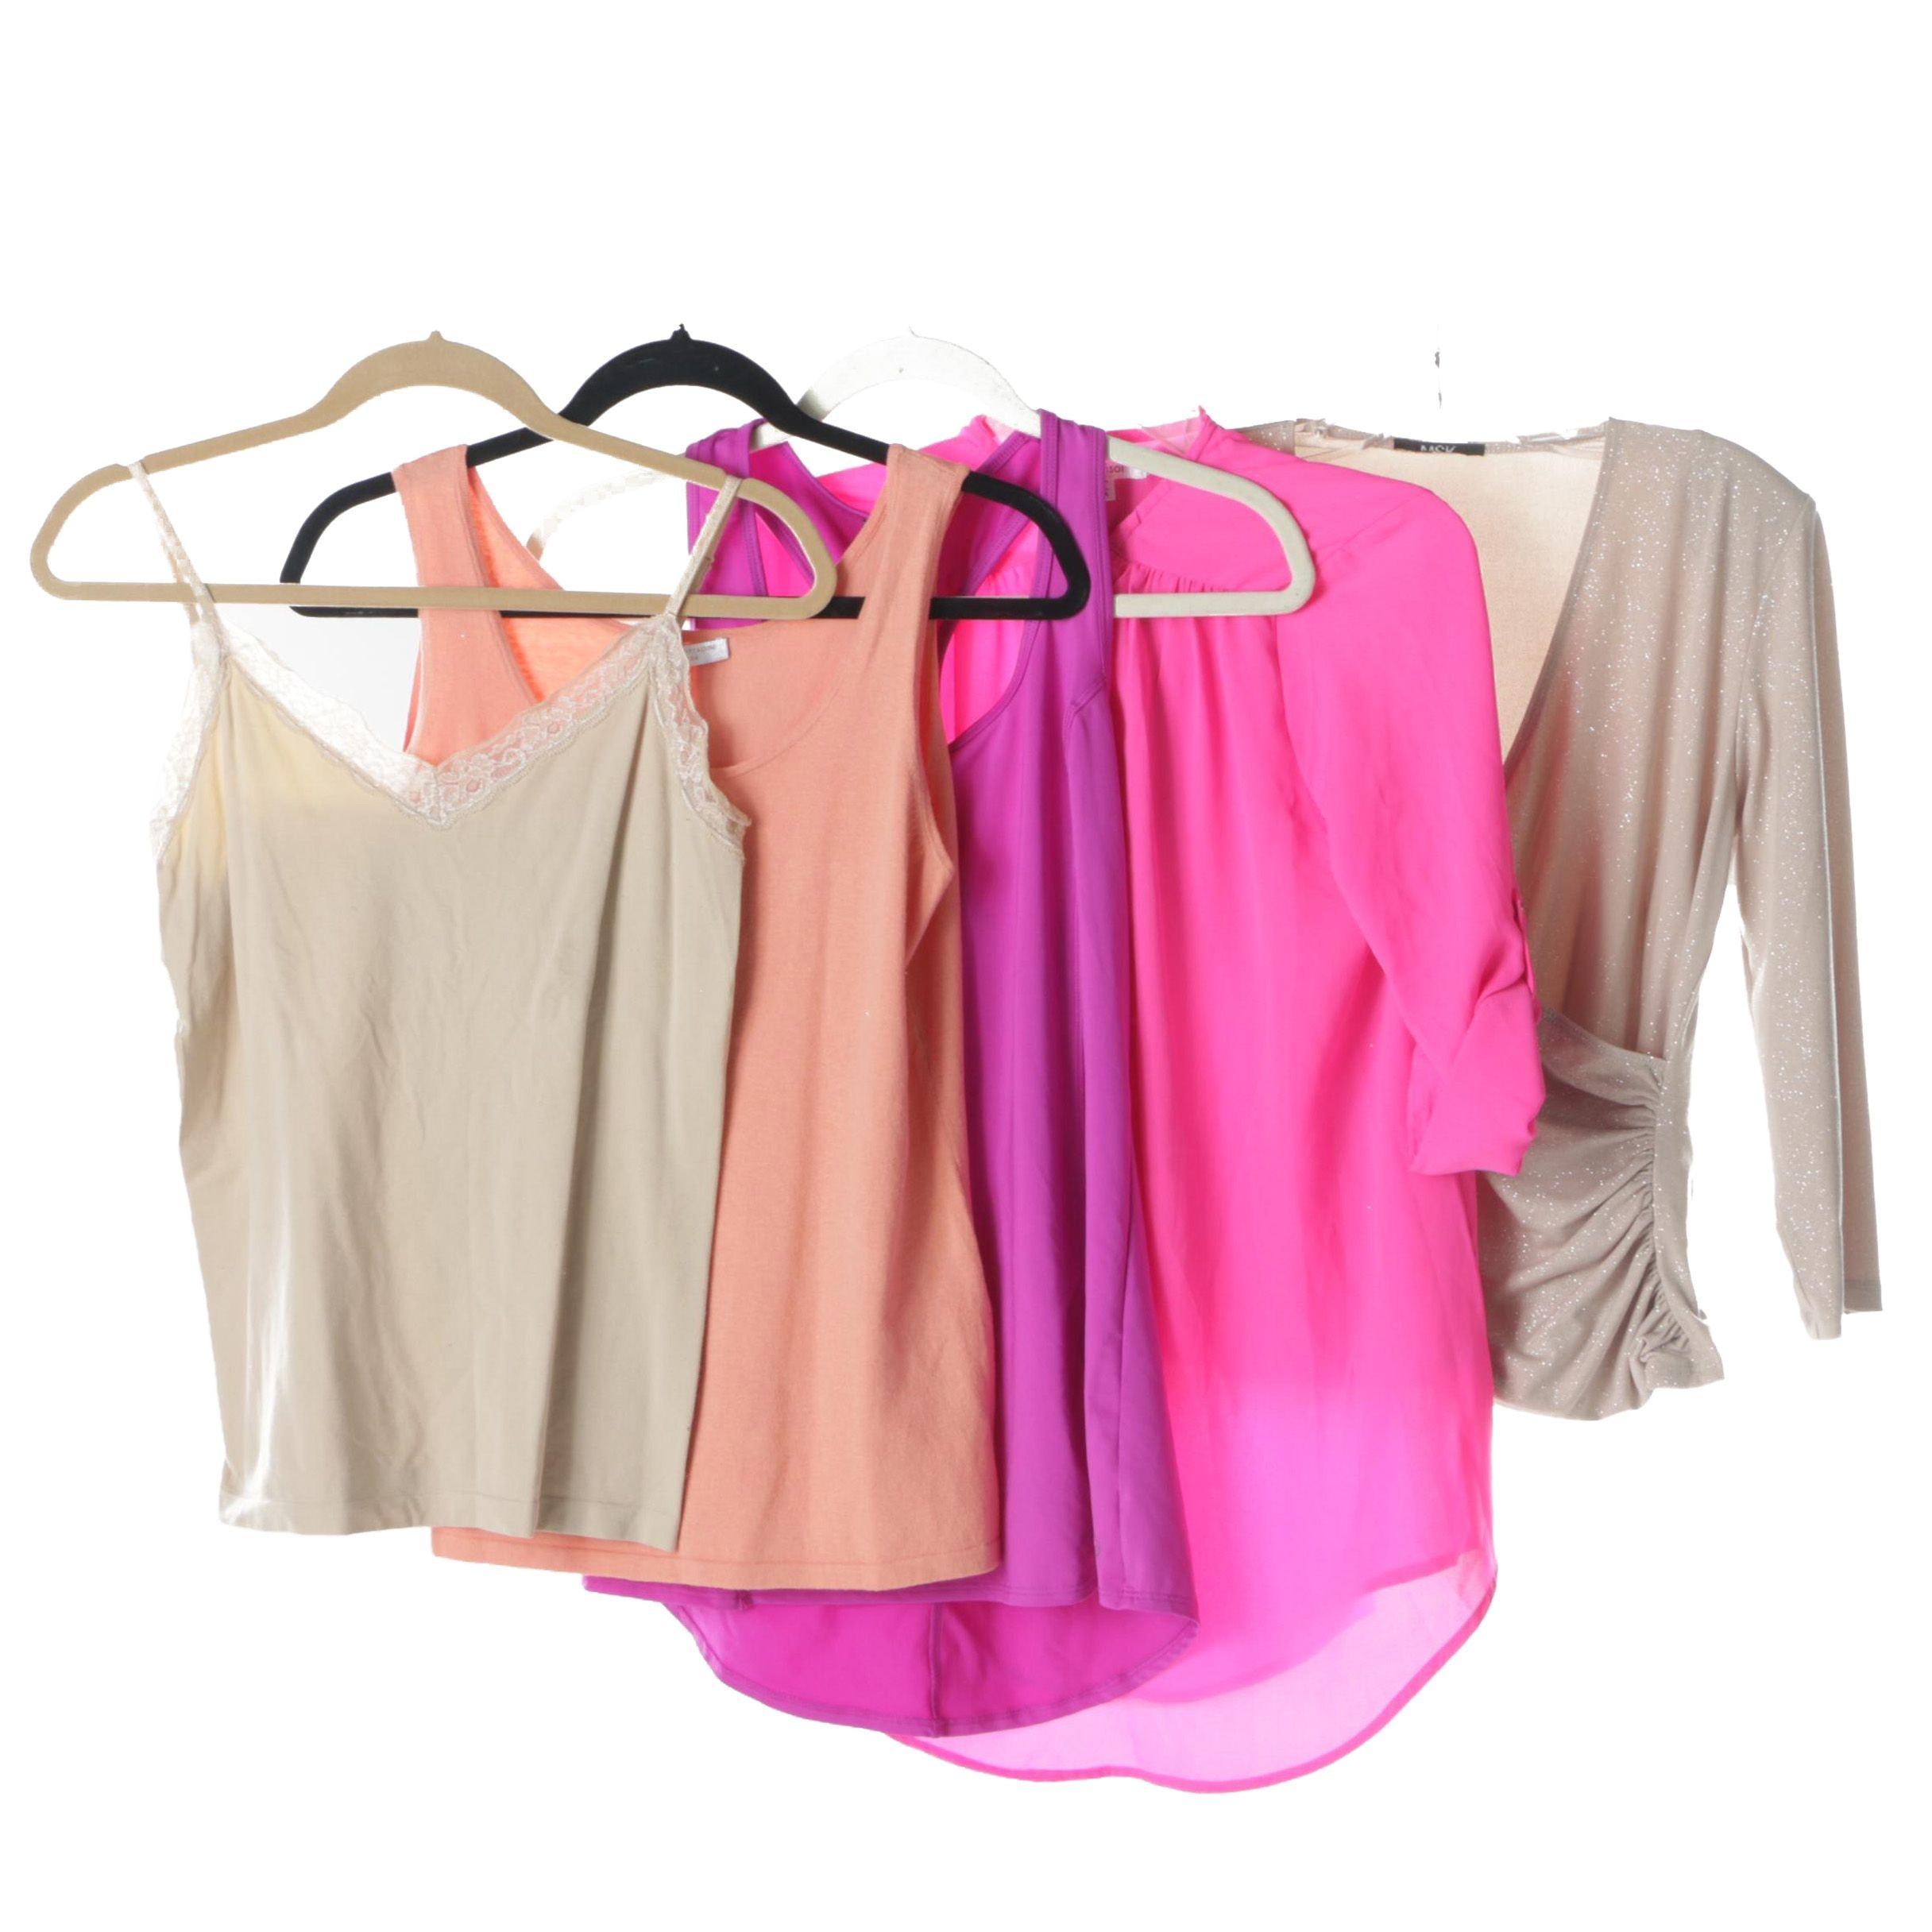 Women's Shirts Including Adrienne Vittadini